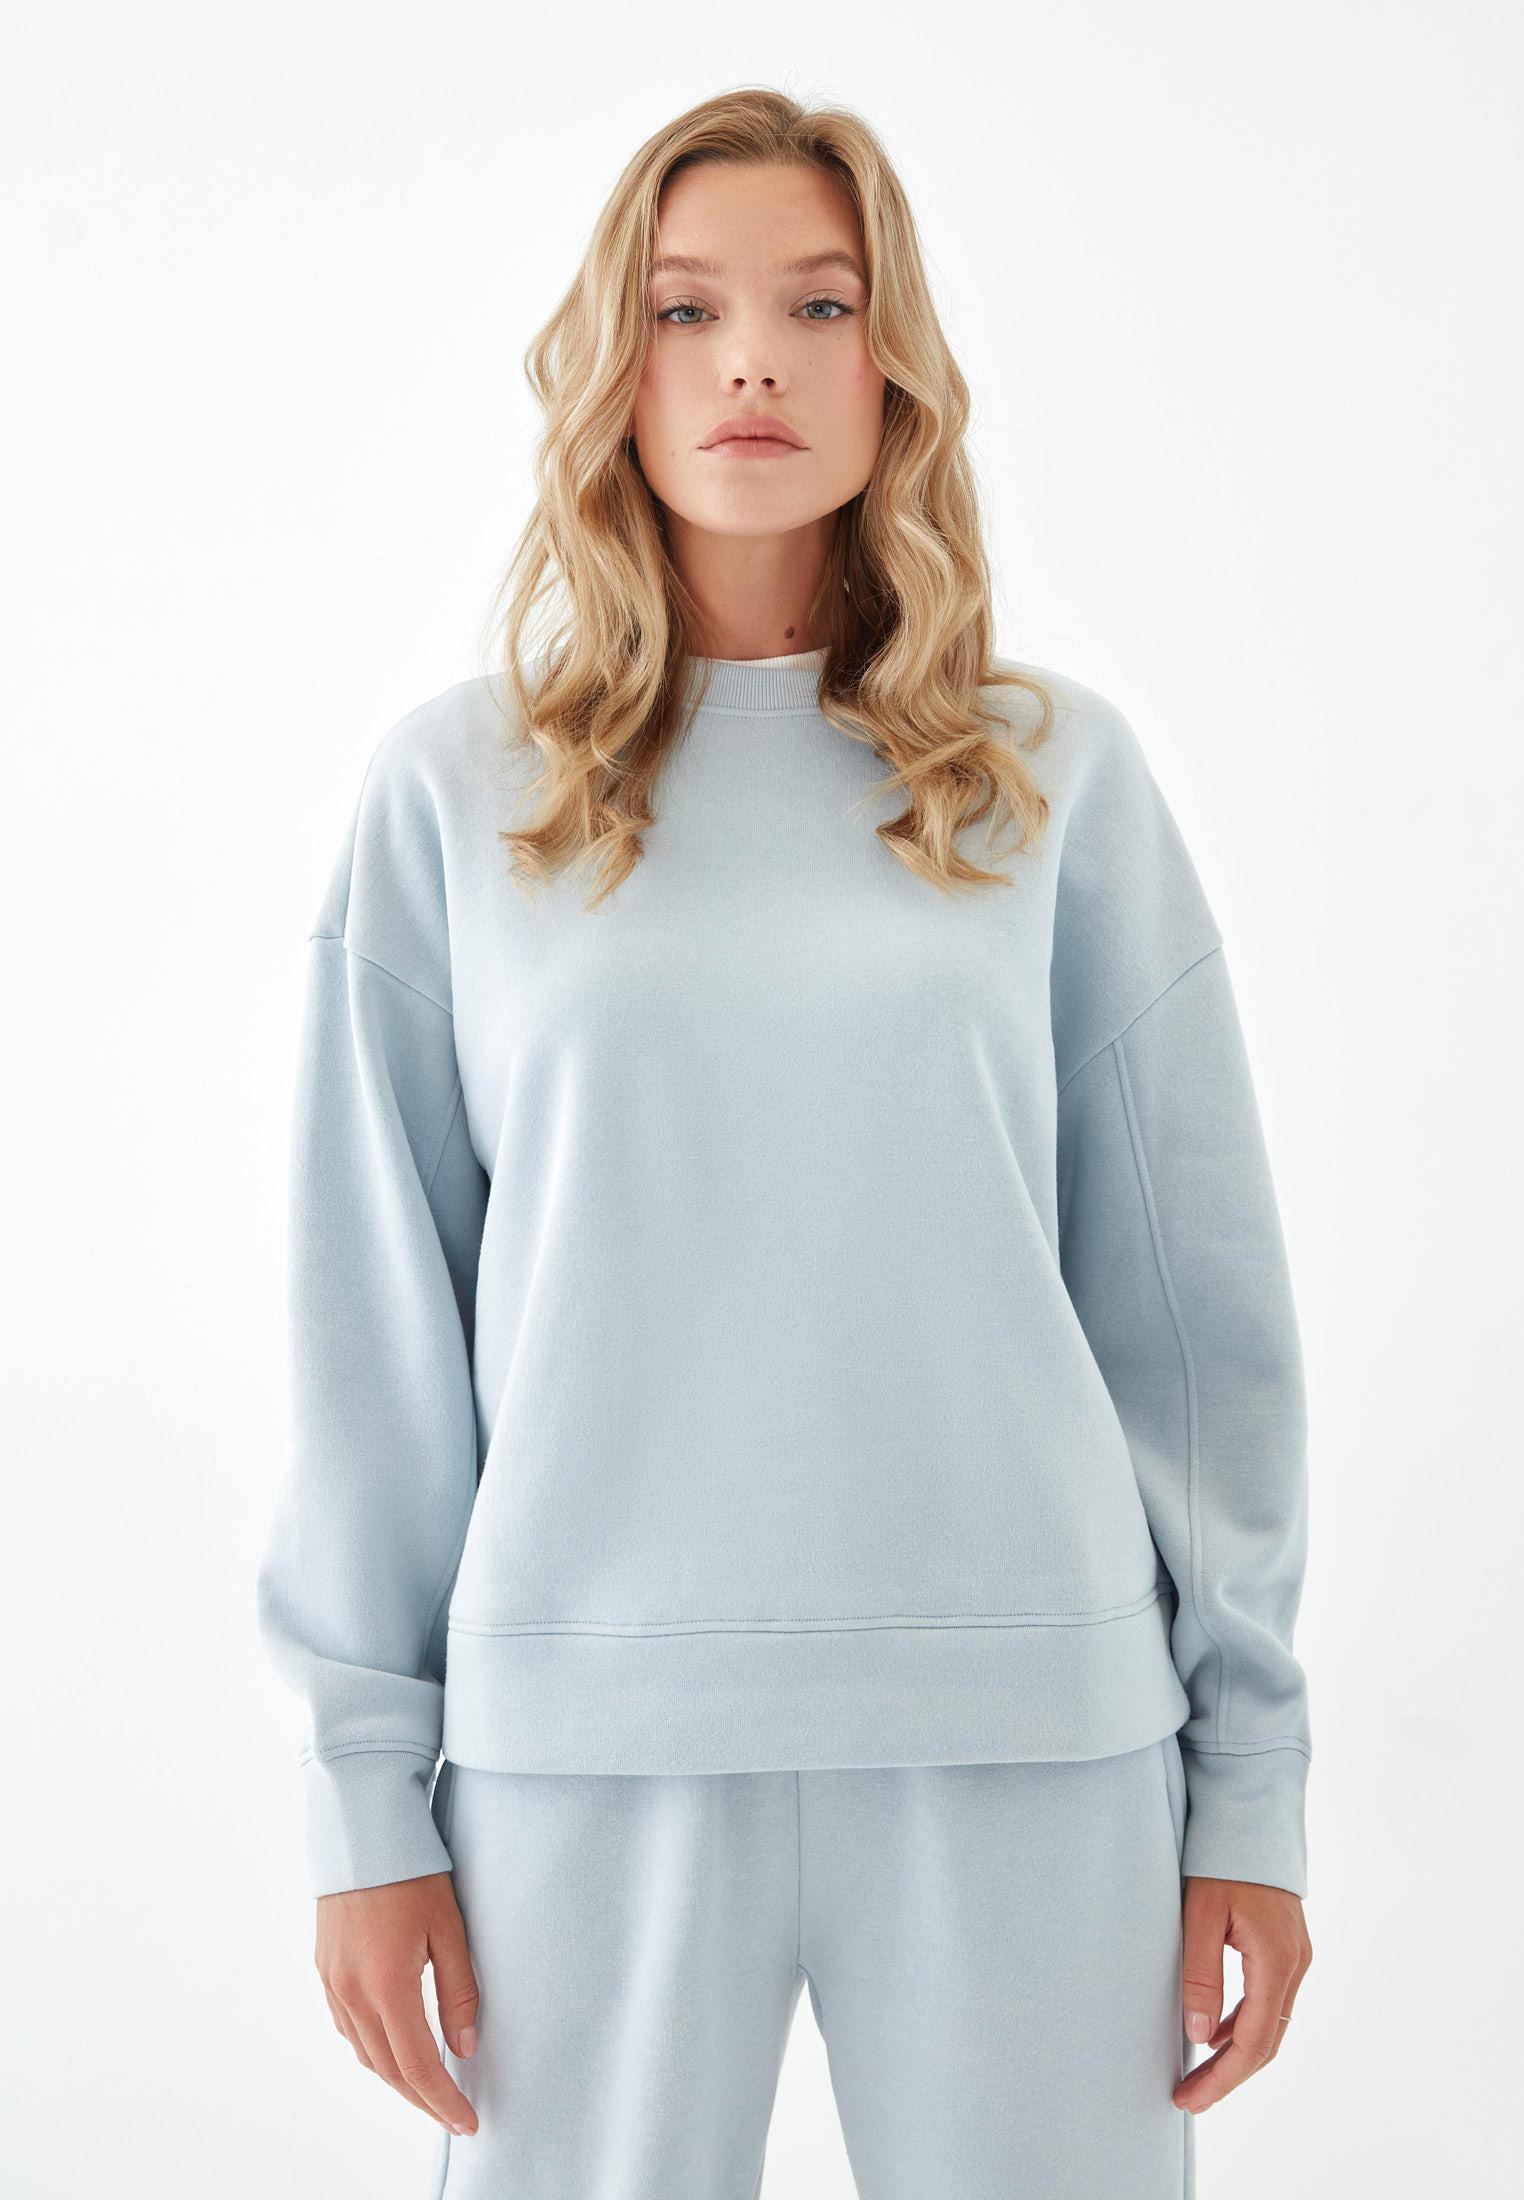 Свитшот Zarina Exclusive online купить за в интернет-магазине Lamoda.ru